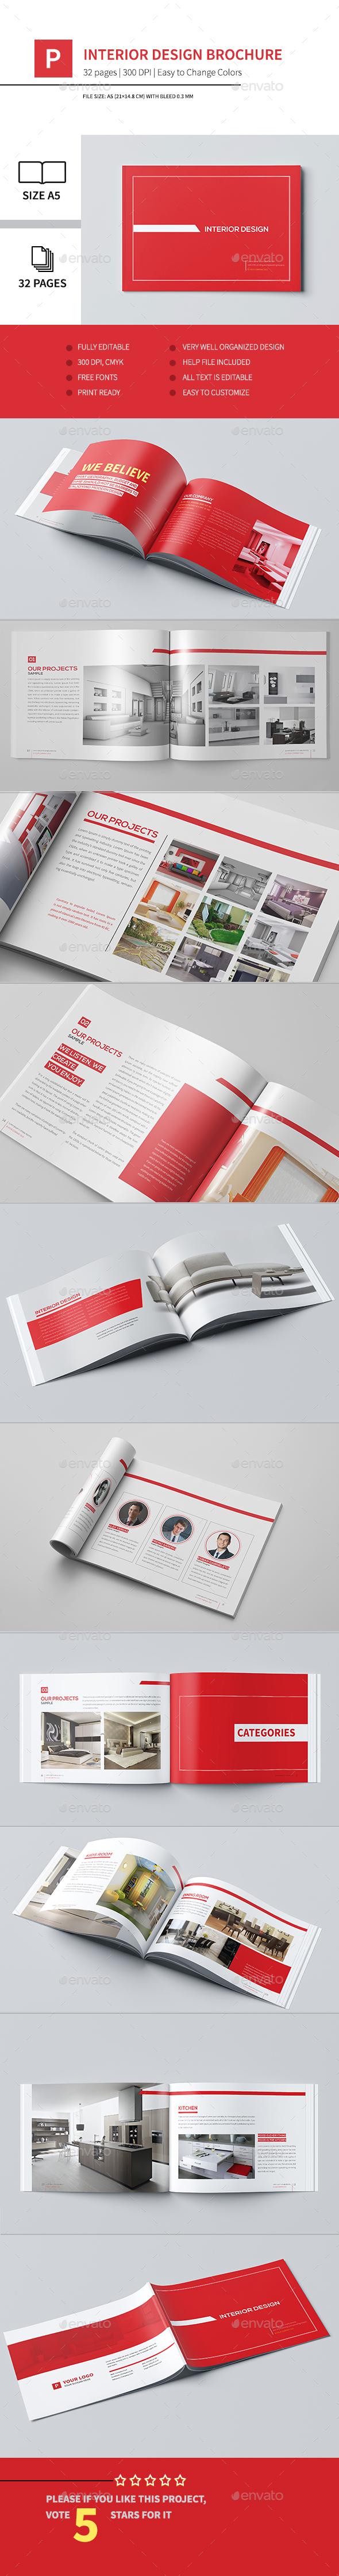 Interior Design Brochure 2015 - Brochures Print Templates